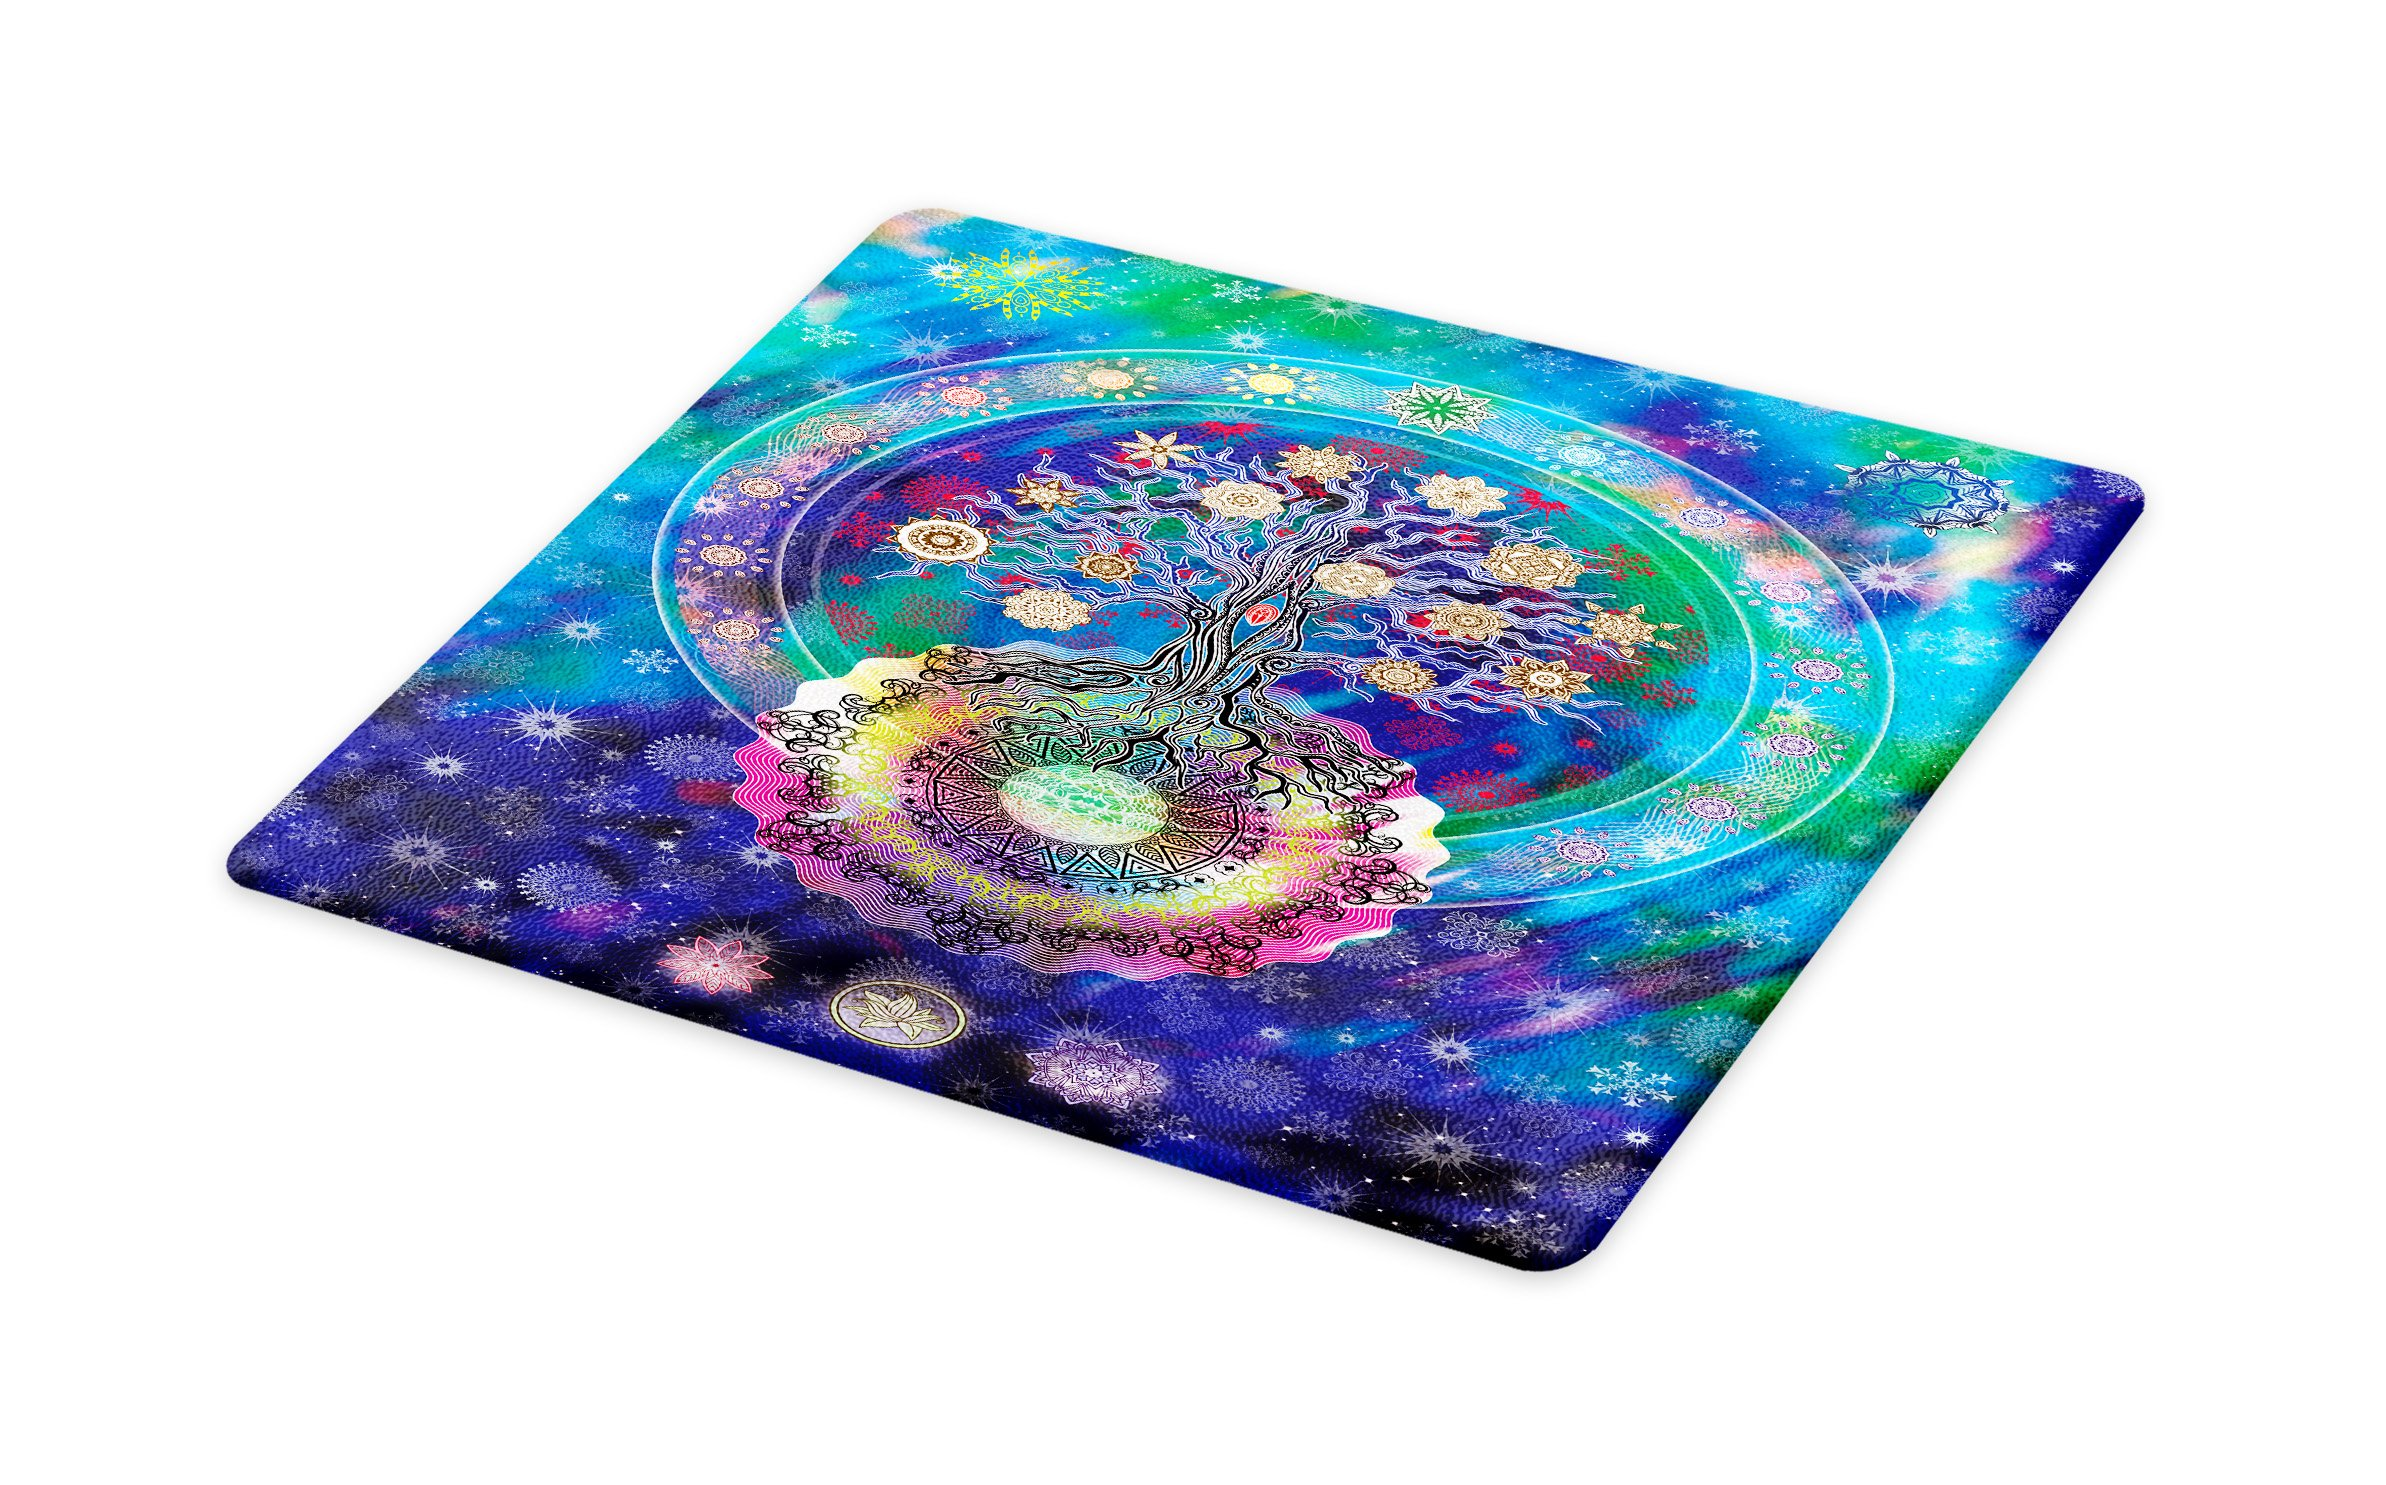 Lunarable Mandala Cutting Board, Tree of Life Floral Style Mandala Spiritual Artwork Meditation Peace Spa Design, Decorative Tempered Glass Cutting and Serving Board, Small Size, Blue Purple